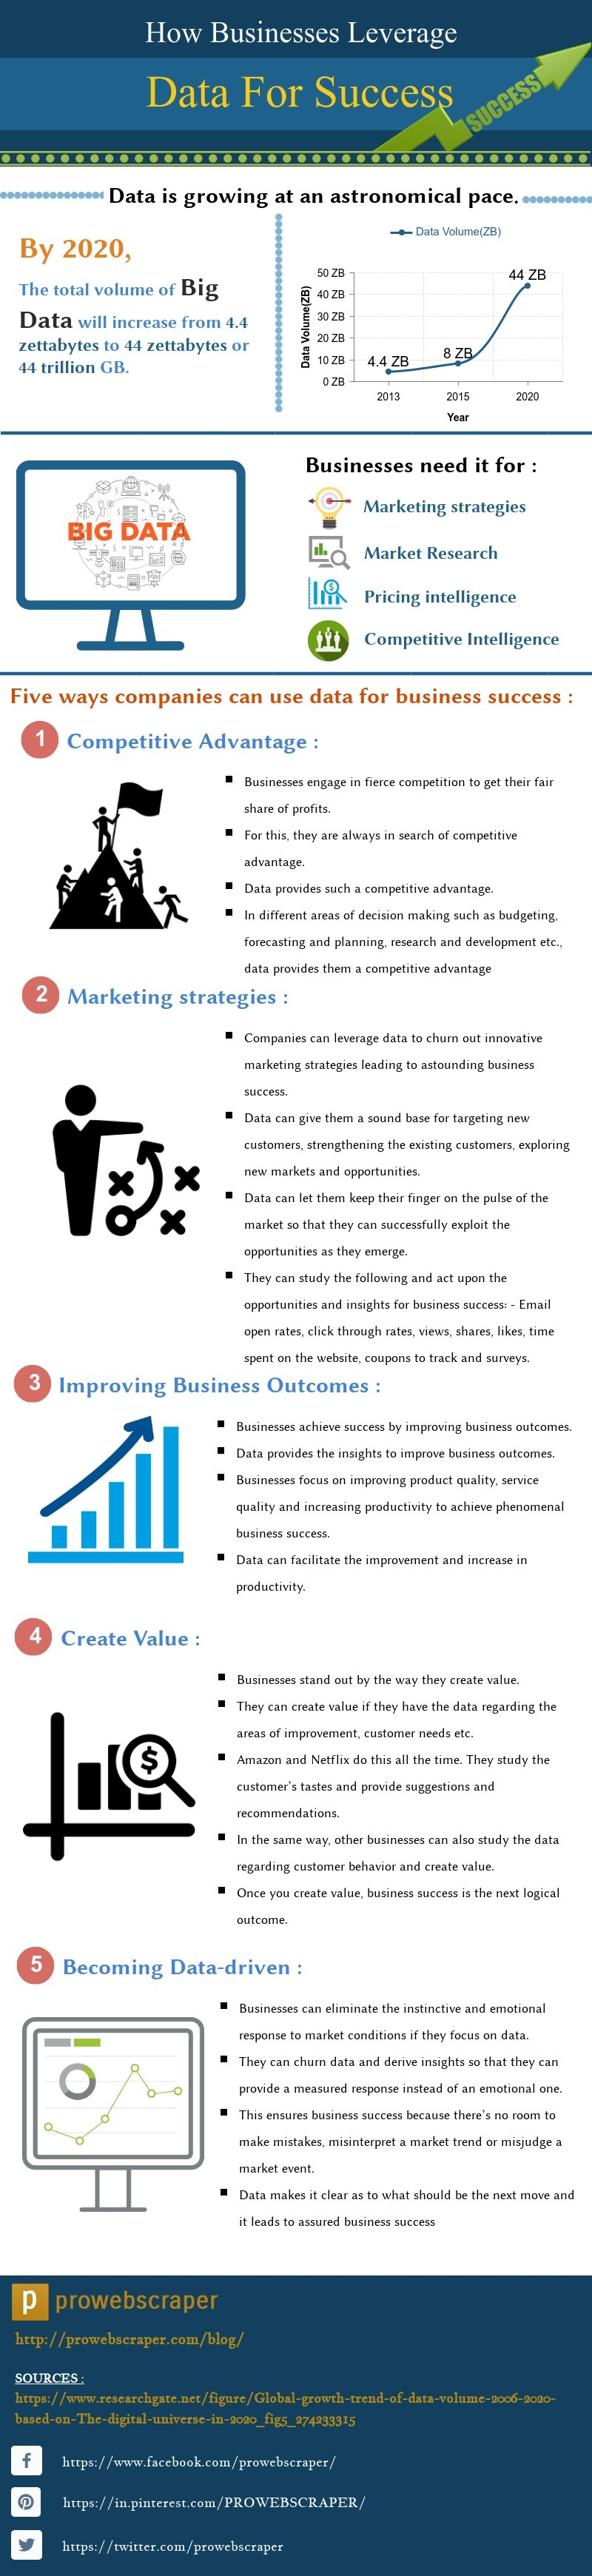 Leverage Data for Success